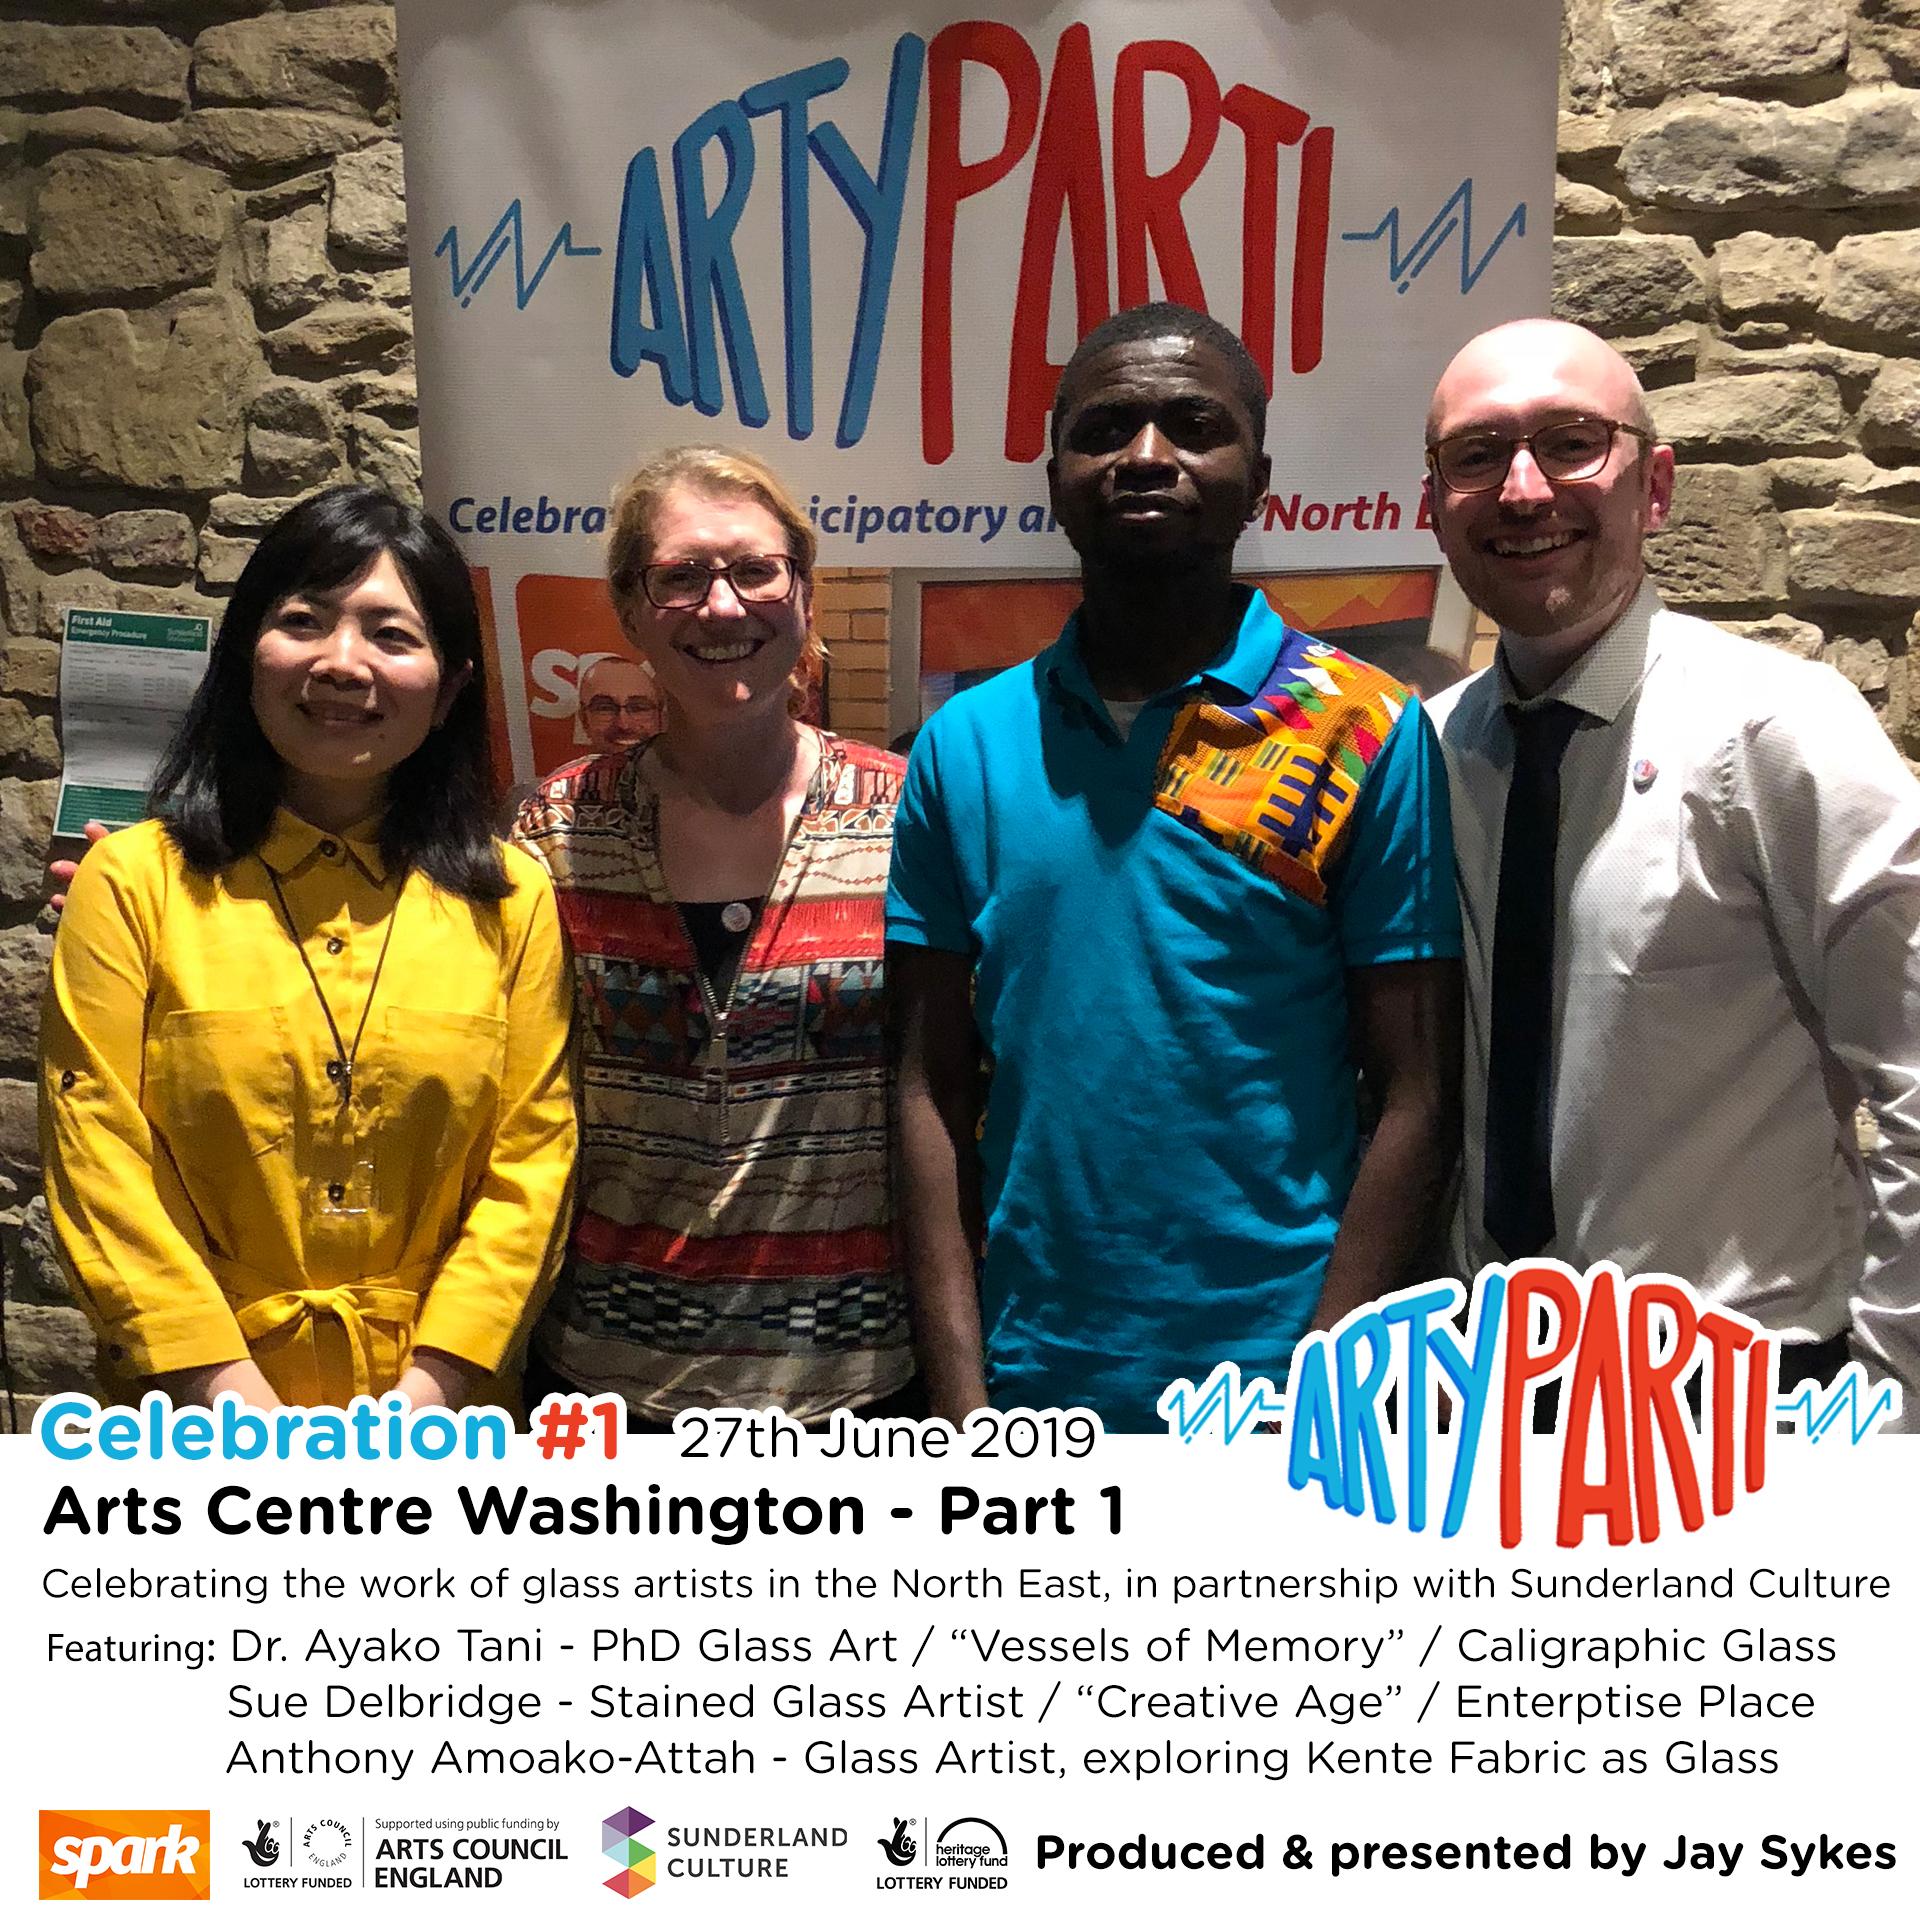 ArtyParti Celebration 1 - Part 1.jpg